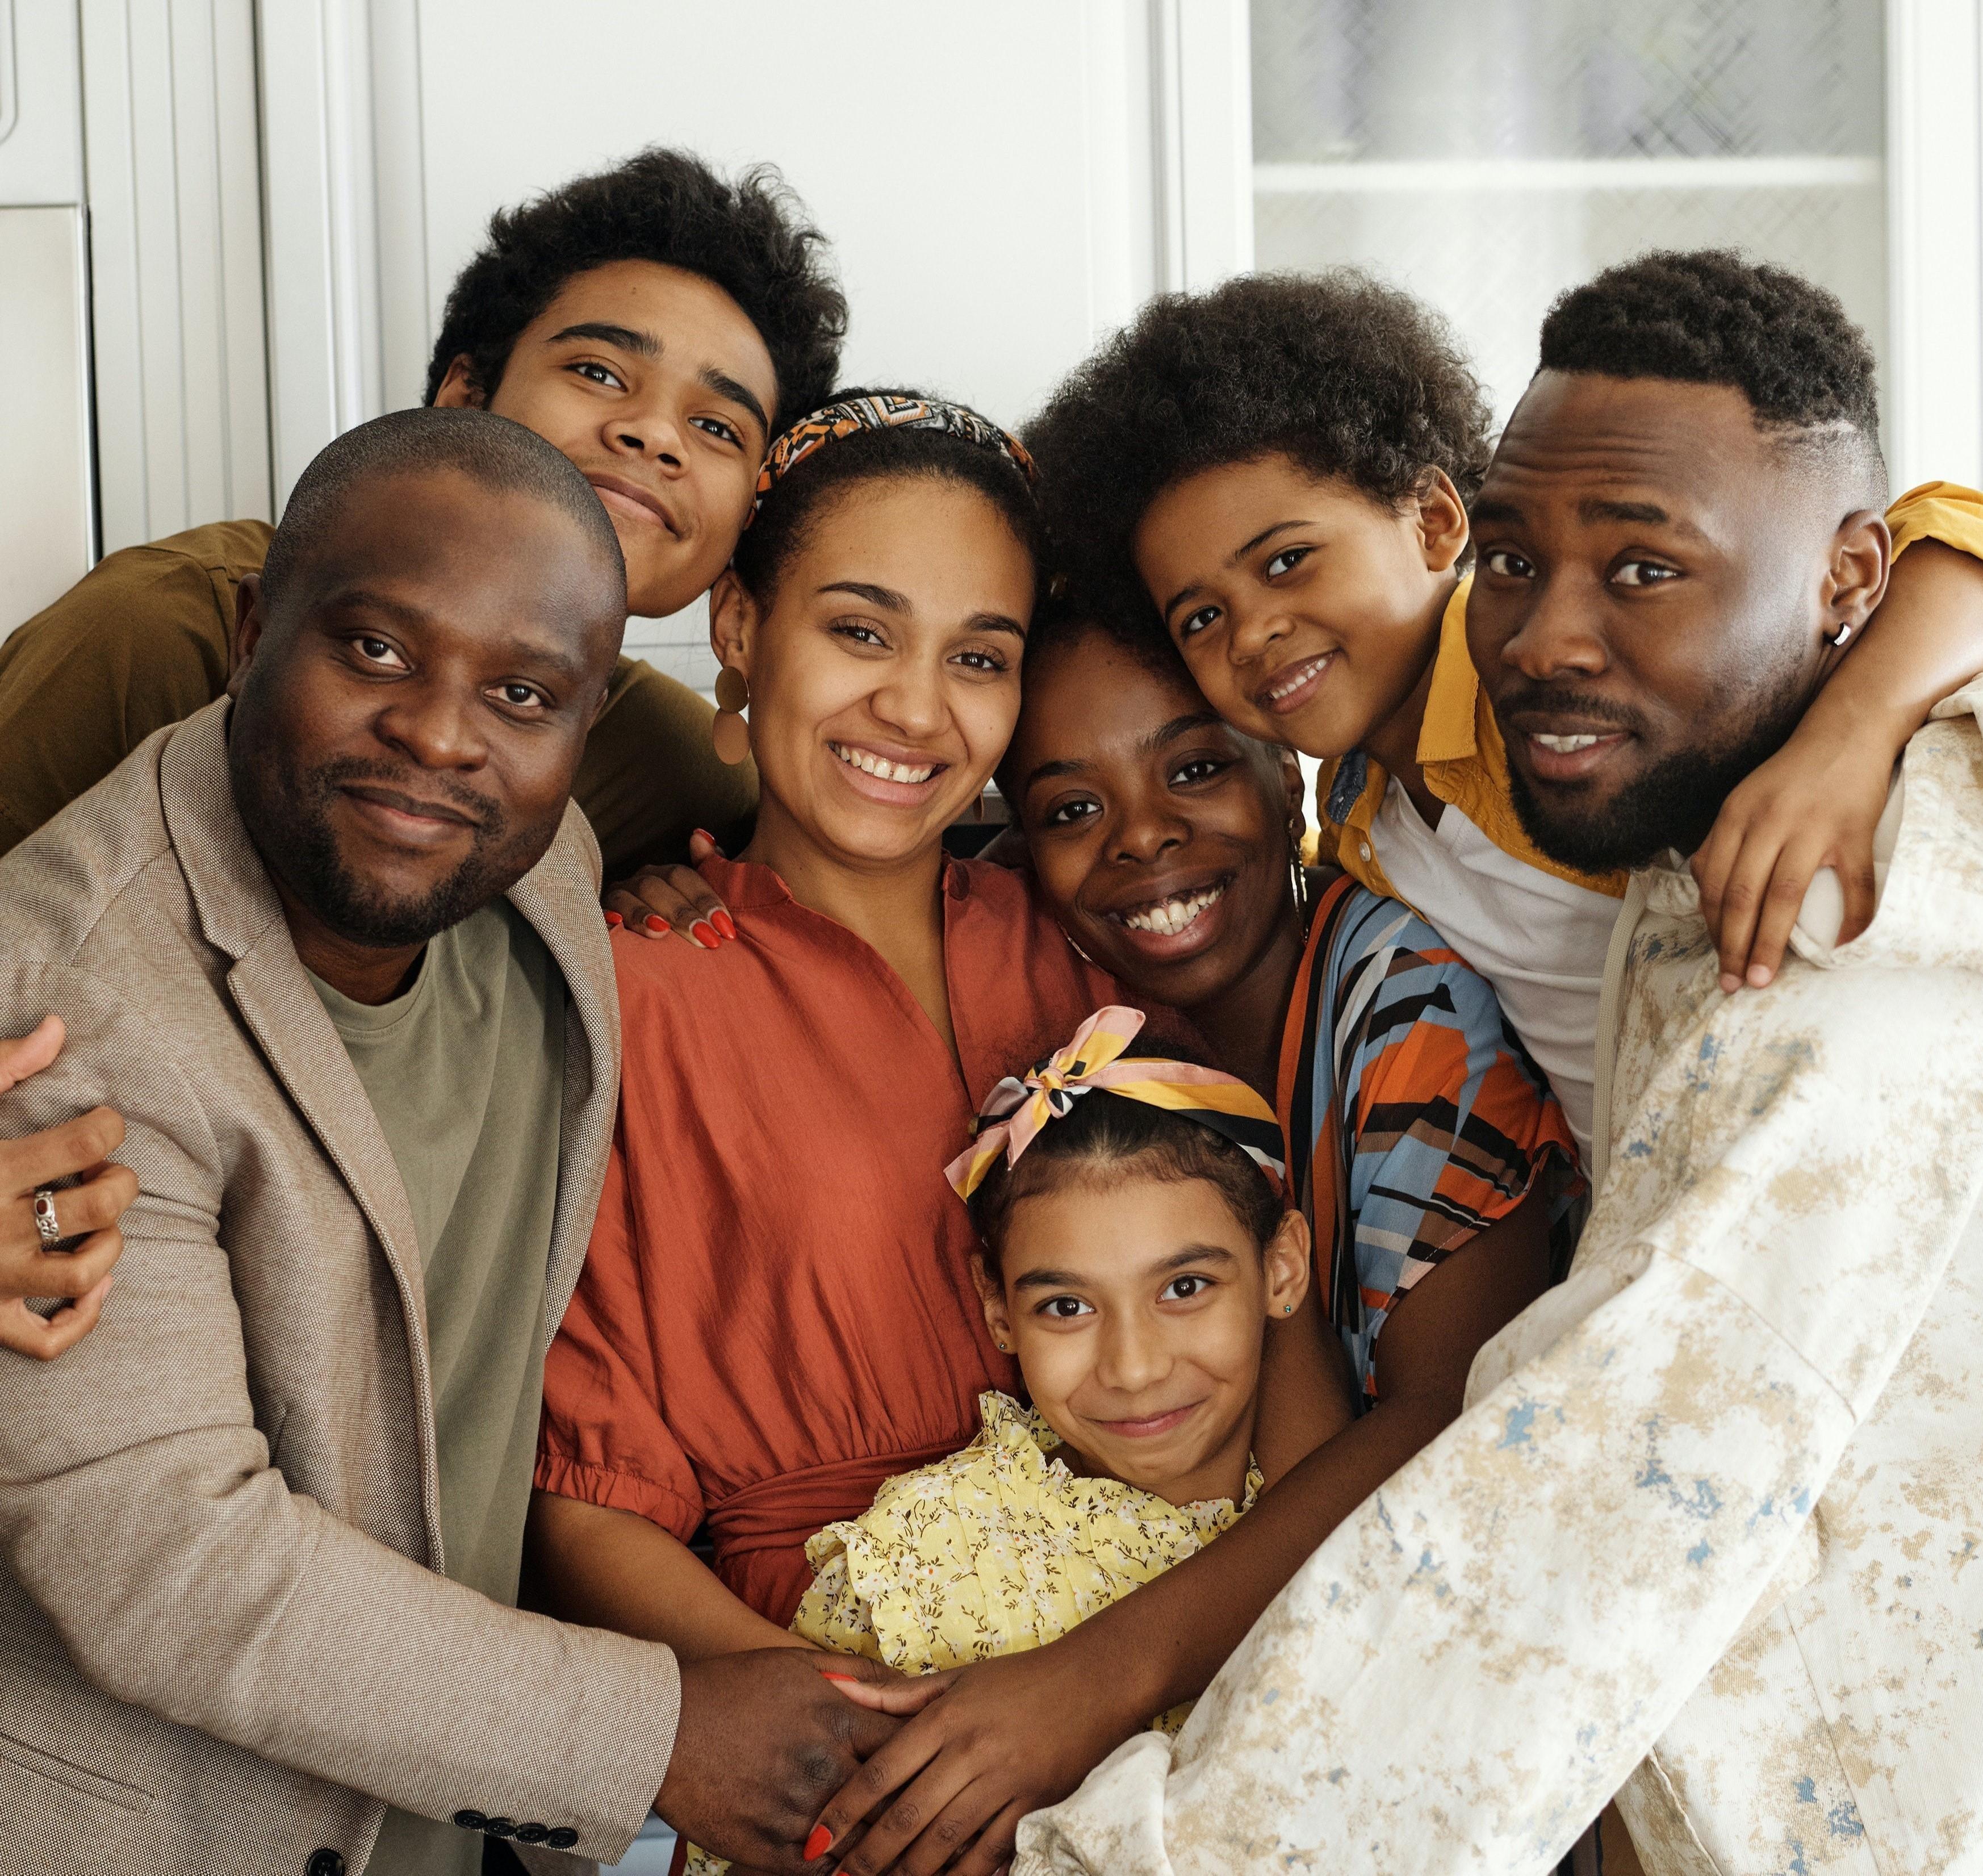 10 Characteristics All Healthy Families Share Thumbnail